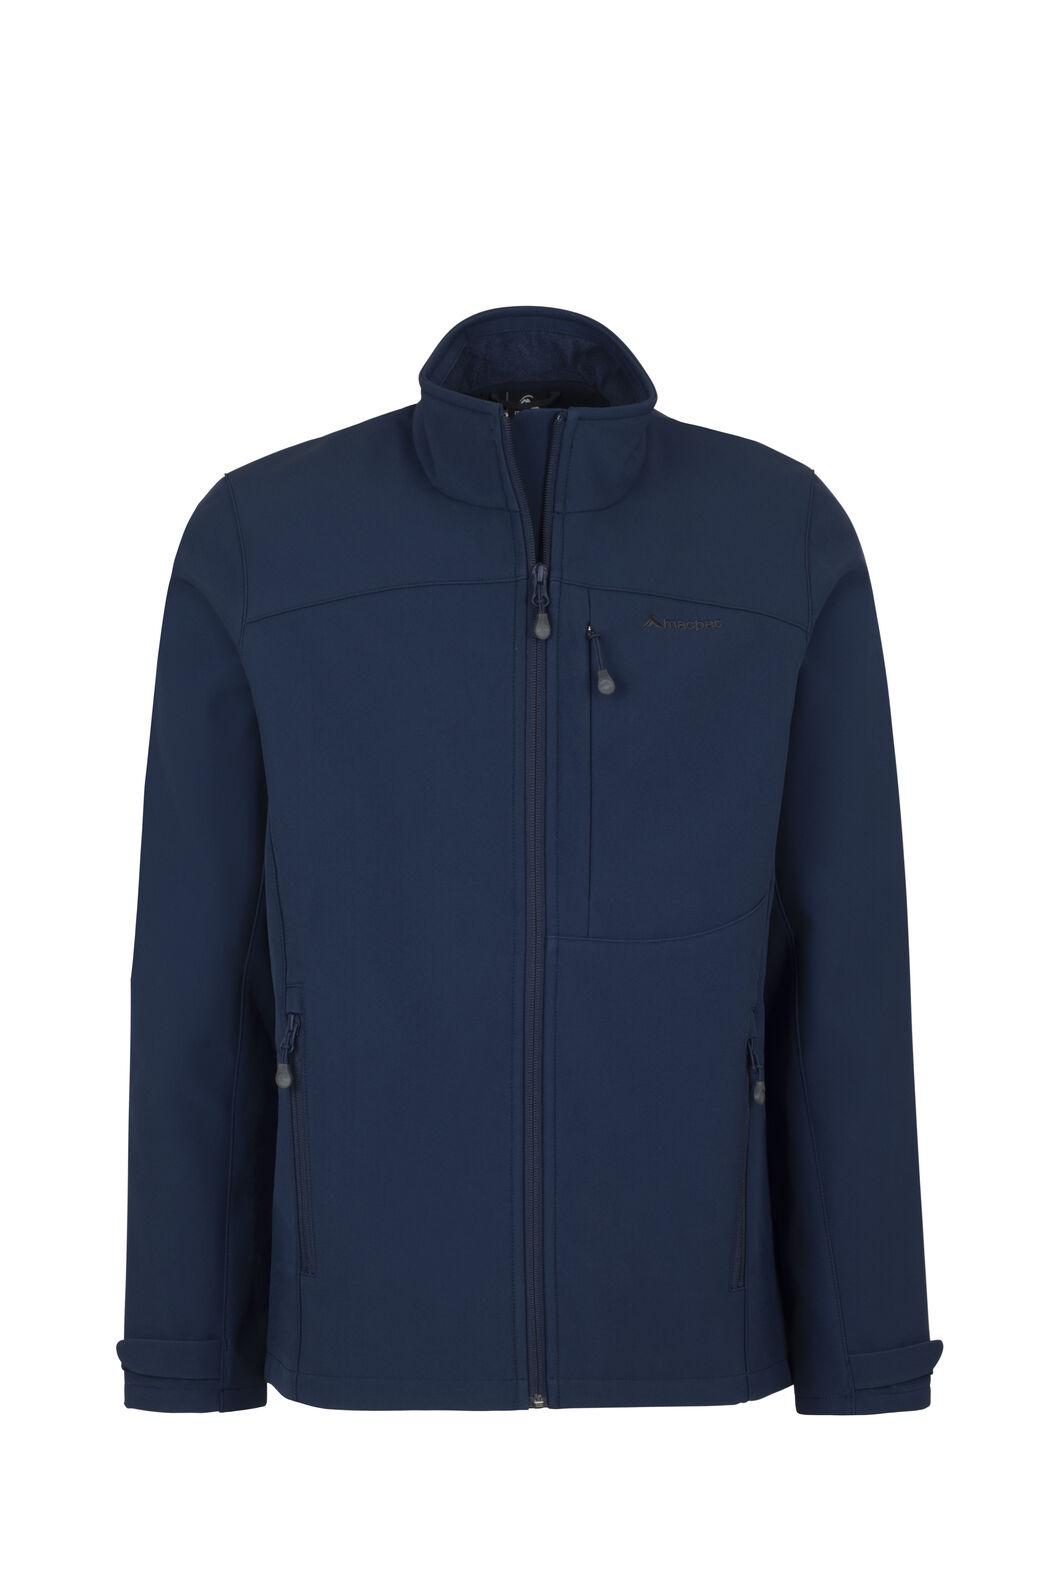 Macpac Sabre Softshell Jacket — Men's, Black Iris, hi-res